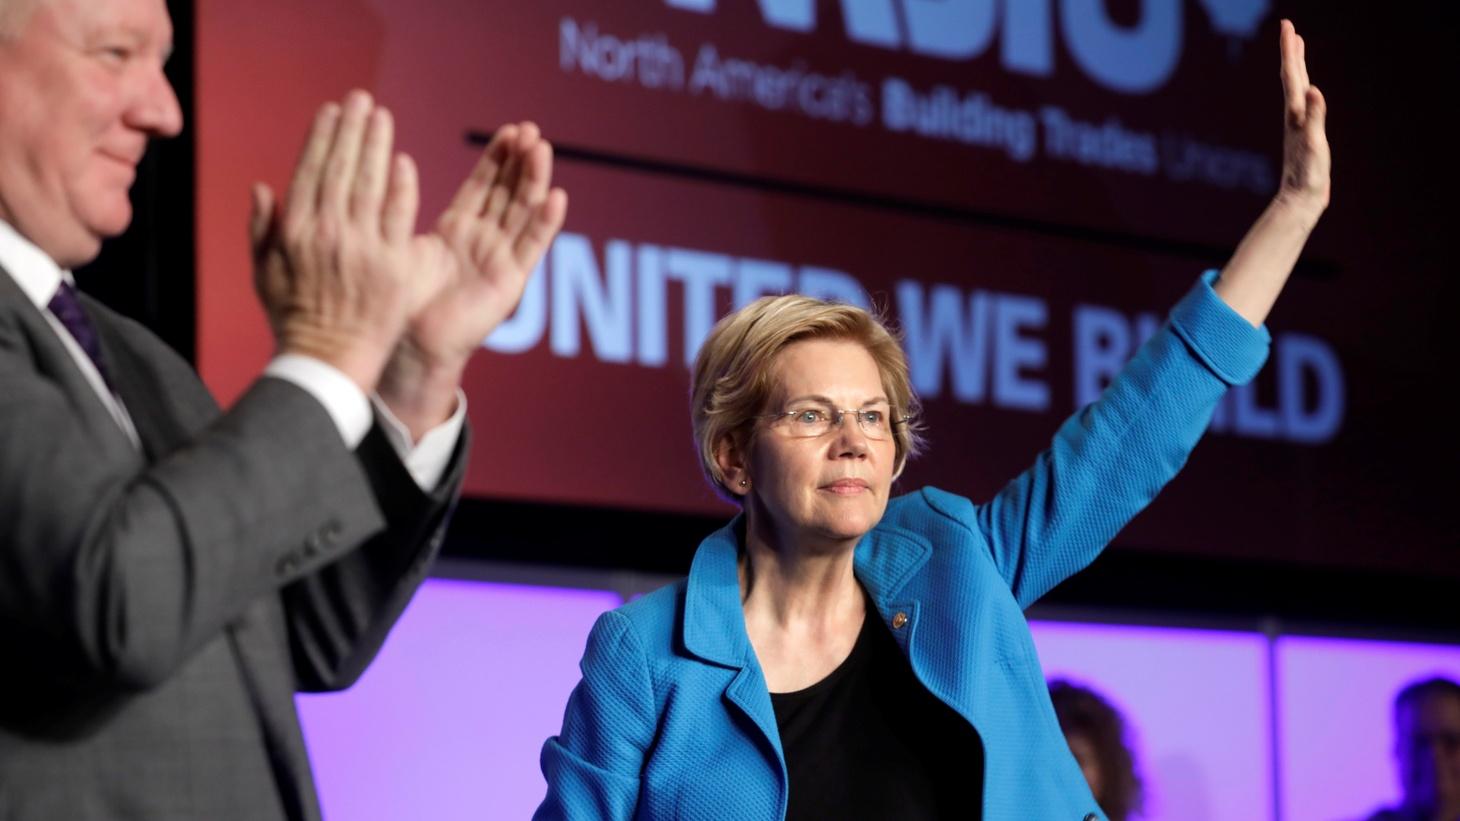 Democratic U.S. presidential candidate Senator Elizabeth Warren (D-MA) waves at the North America's Building Trades Unions (NABTU) 2019 legislative conference in Washington, U.S., April 10, 2019.